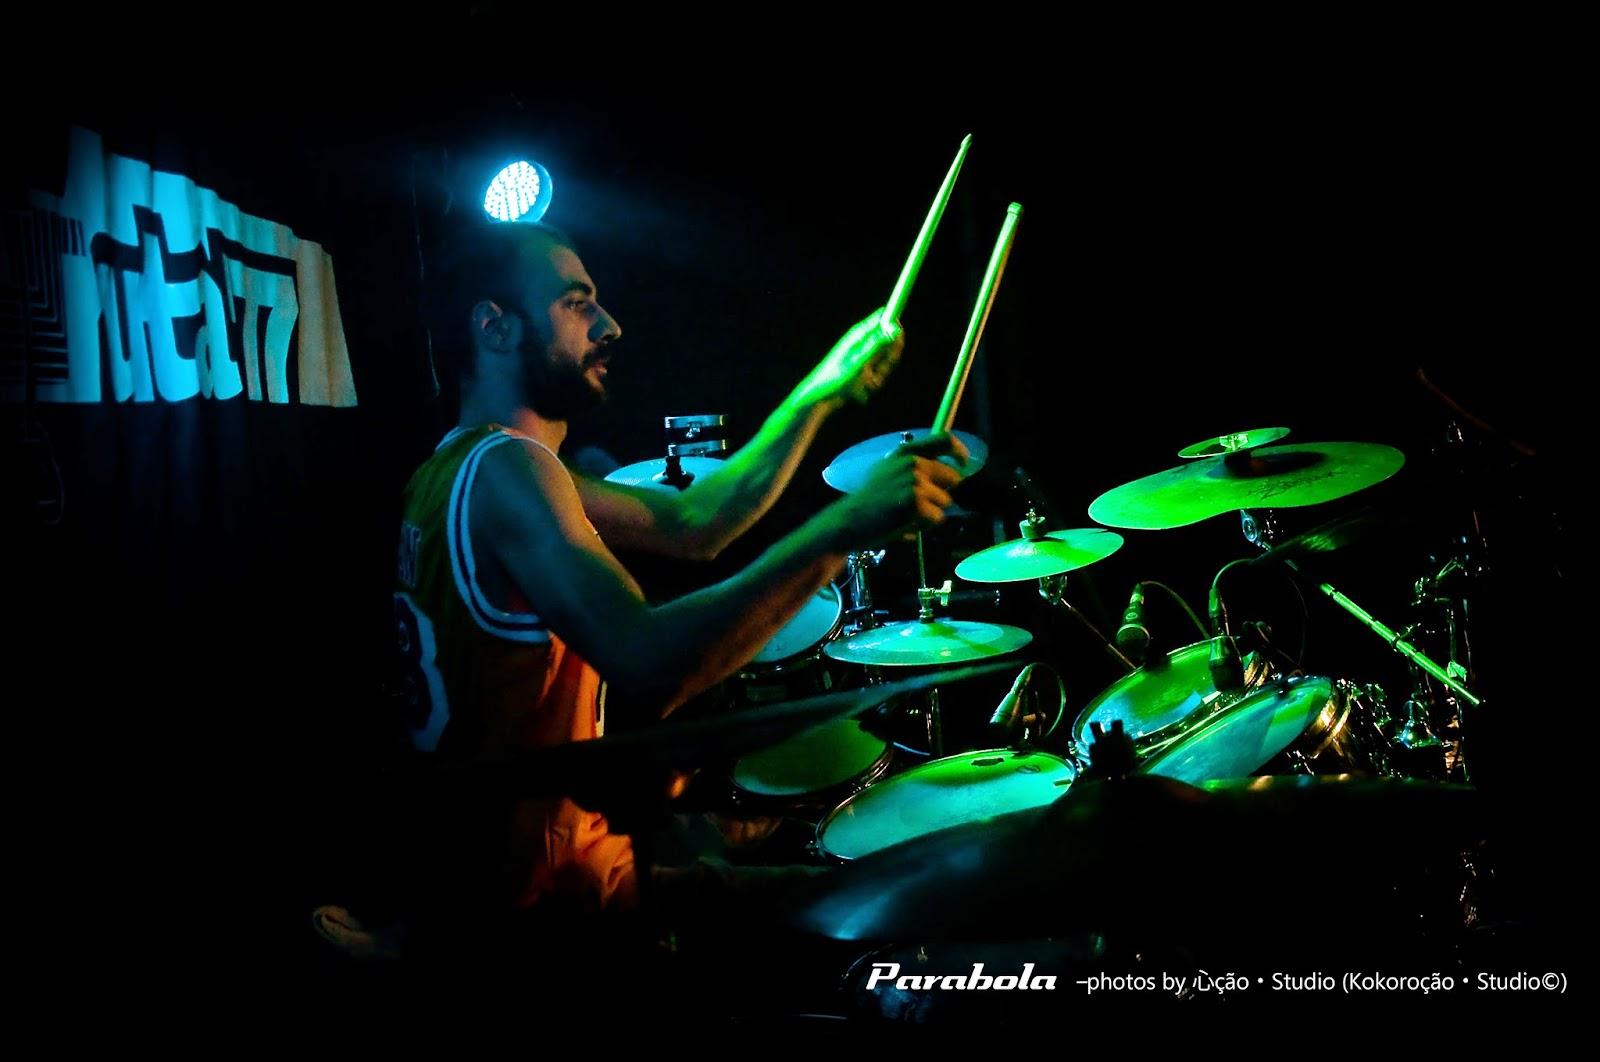 PHOTO SESSION - PARABOLA (TOOL TRIBUTE) LIVE AT GRUTA 77 - PART. 2